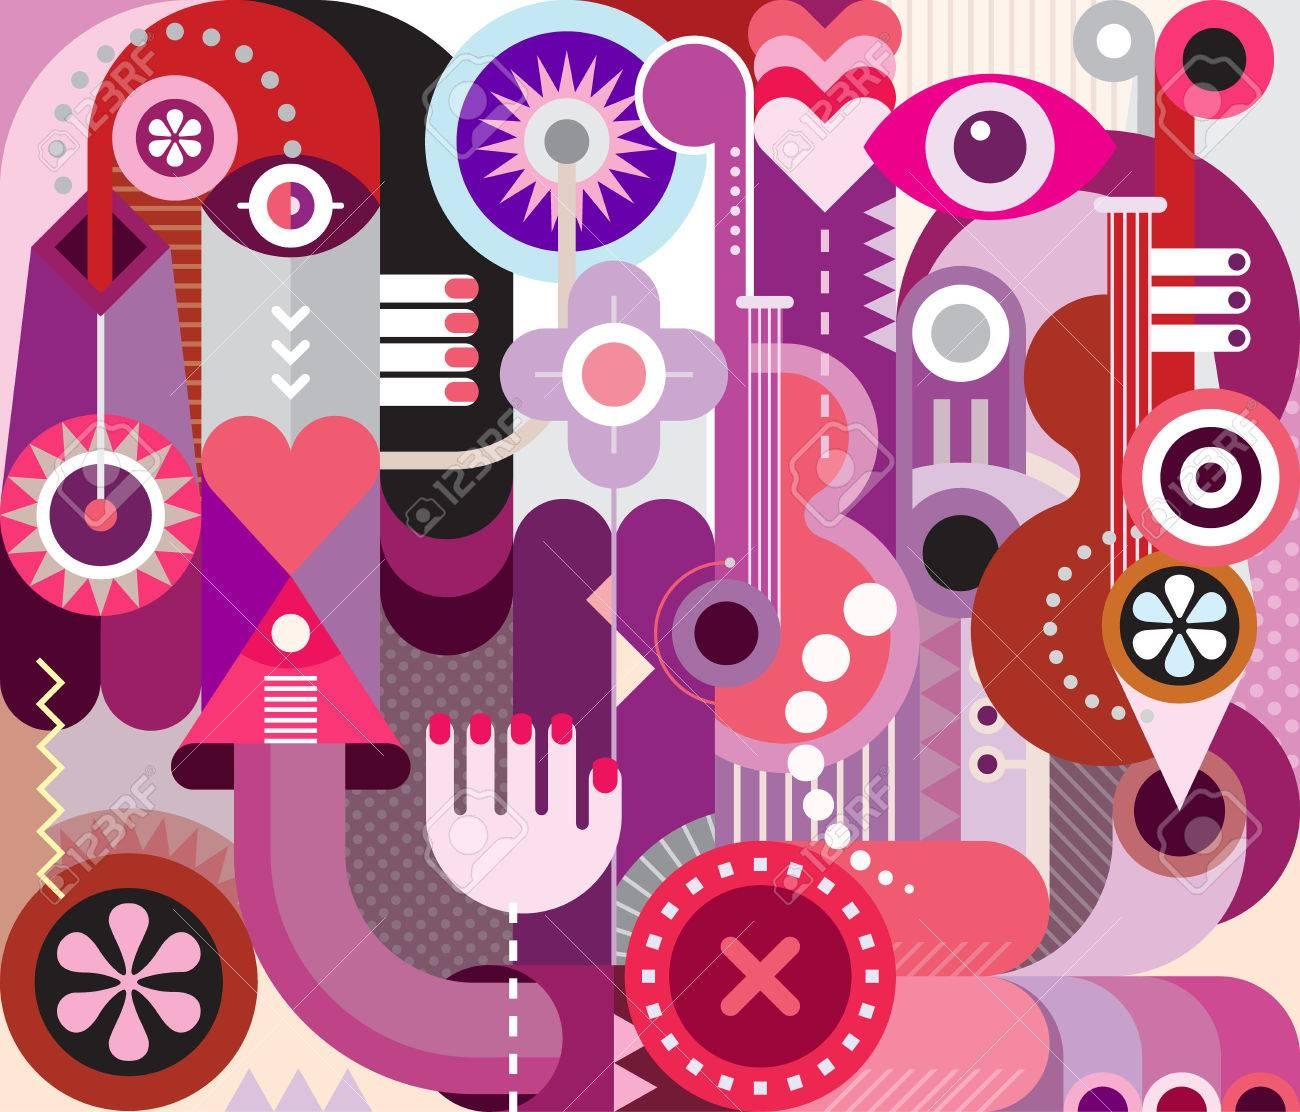 Music festival poster  Abstract art vector design, decorative